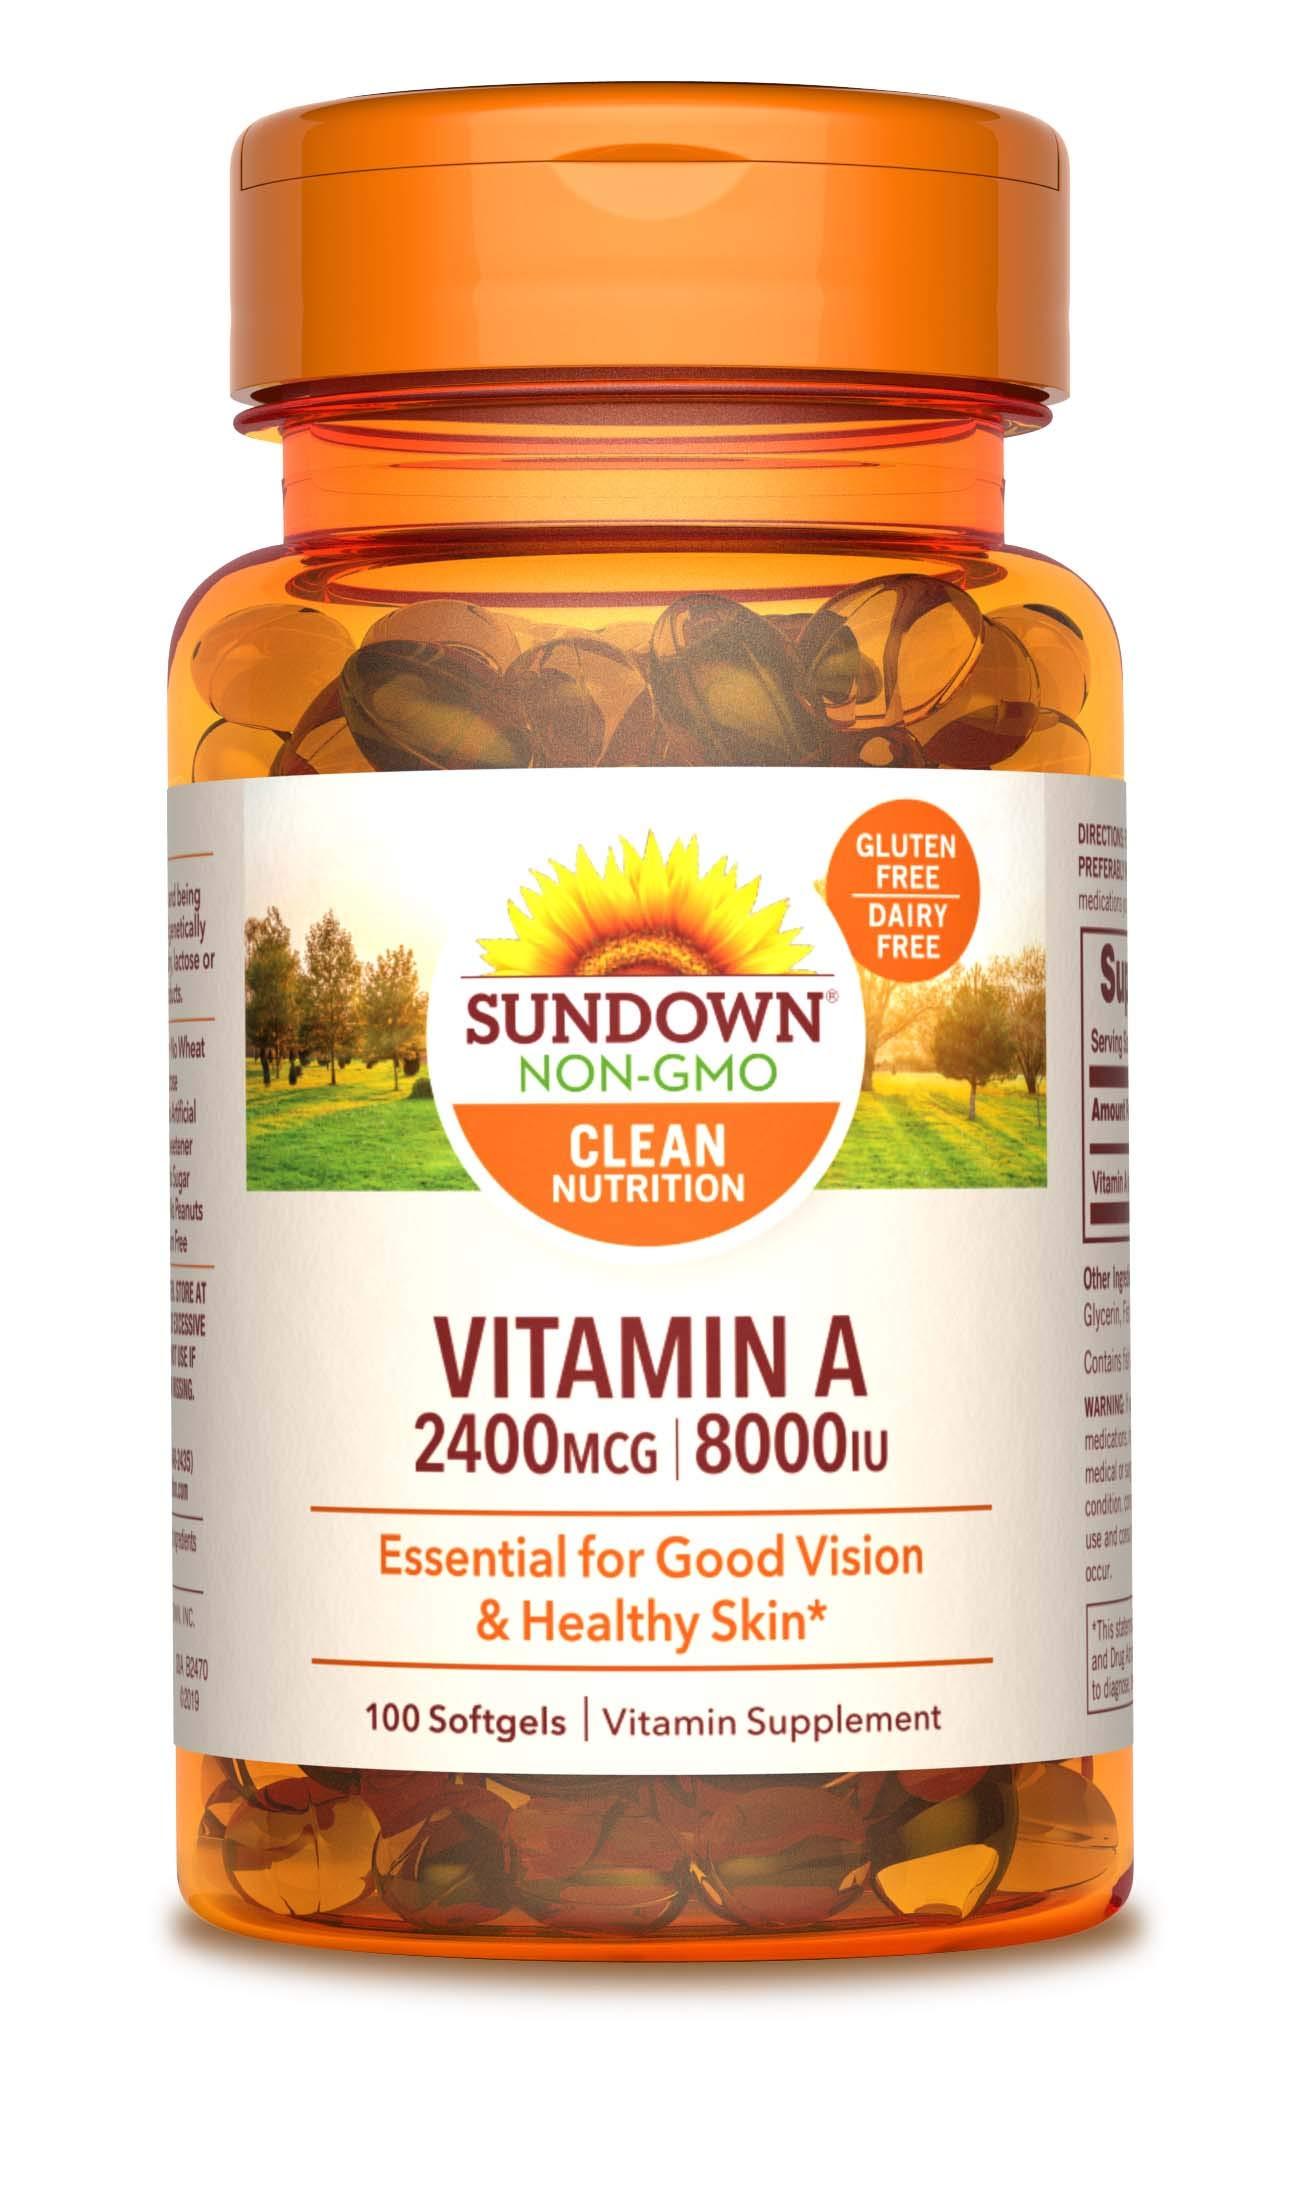 Sundown A 2400 Mcg 8000 Iu Softgels, 100 Count (Packaging May Vary)